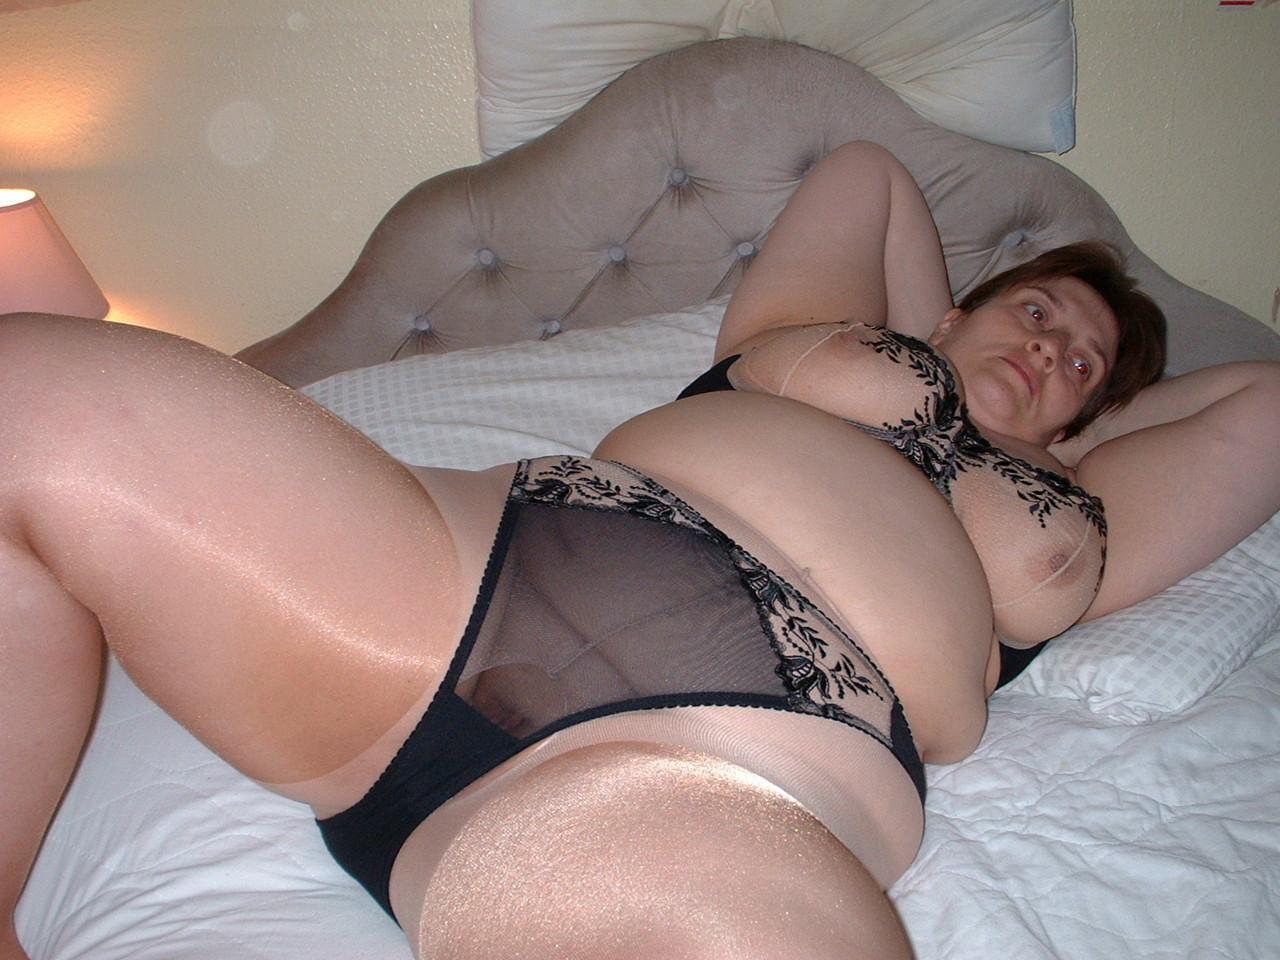 My naked girlfriend in lingerie